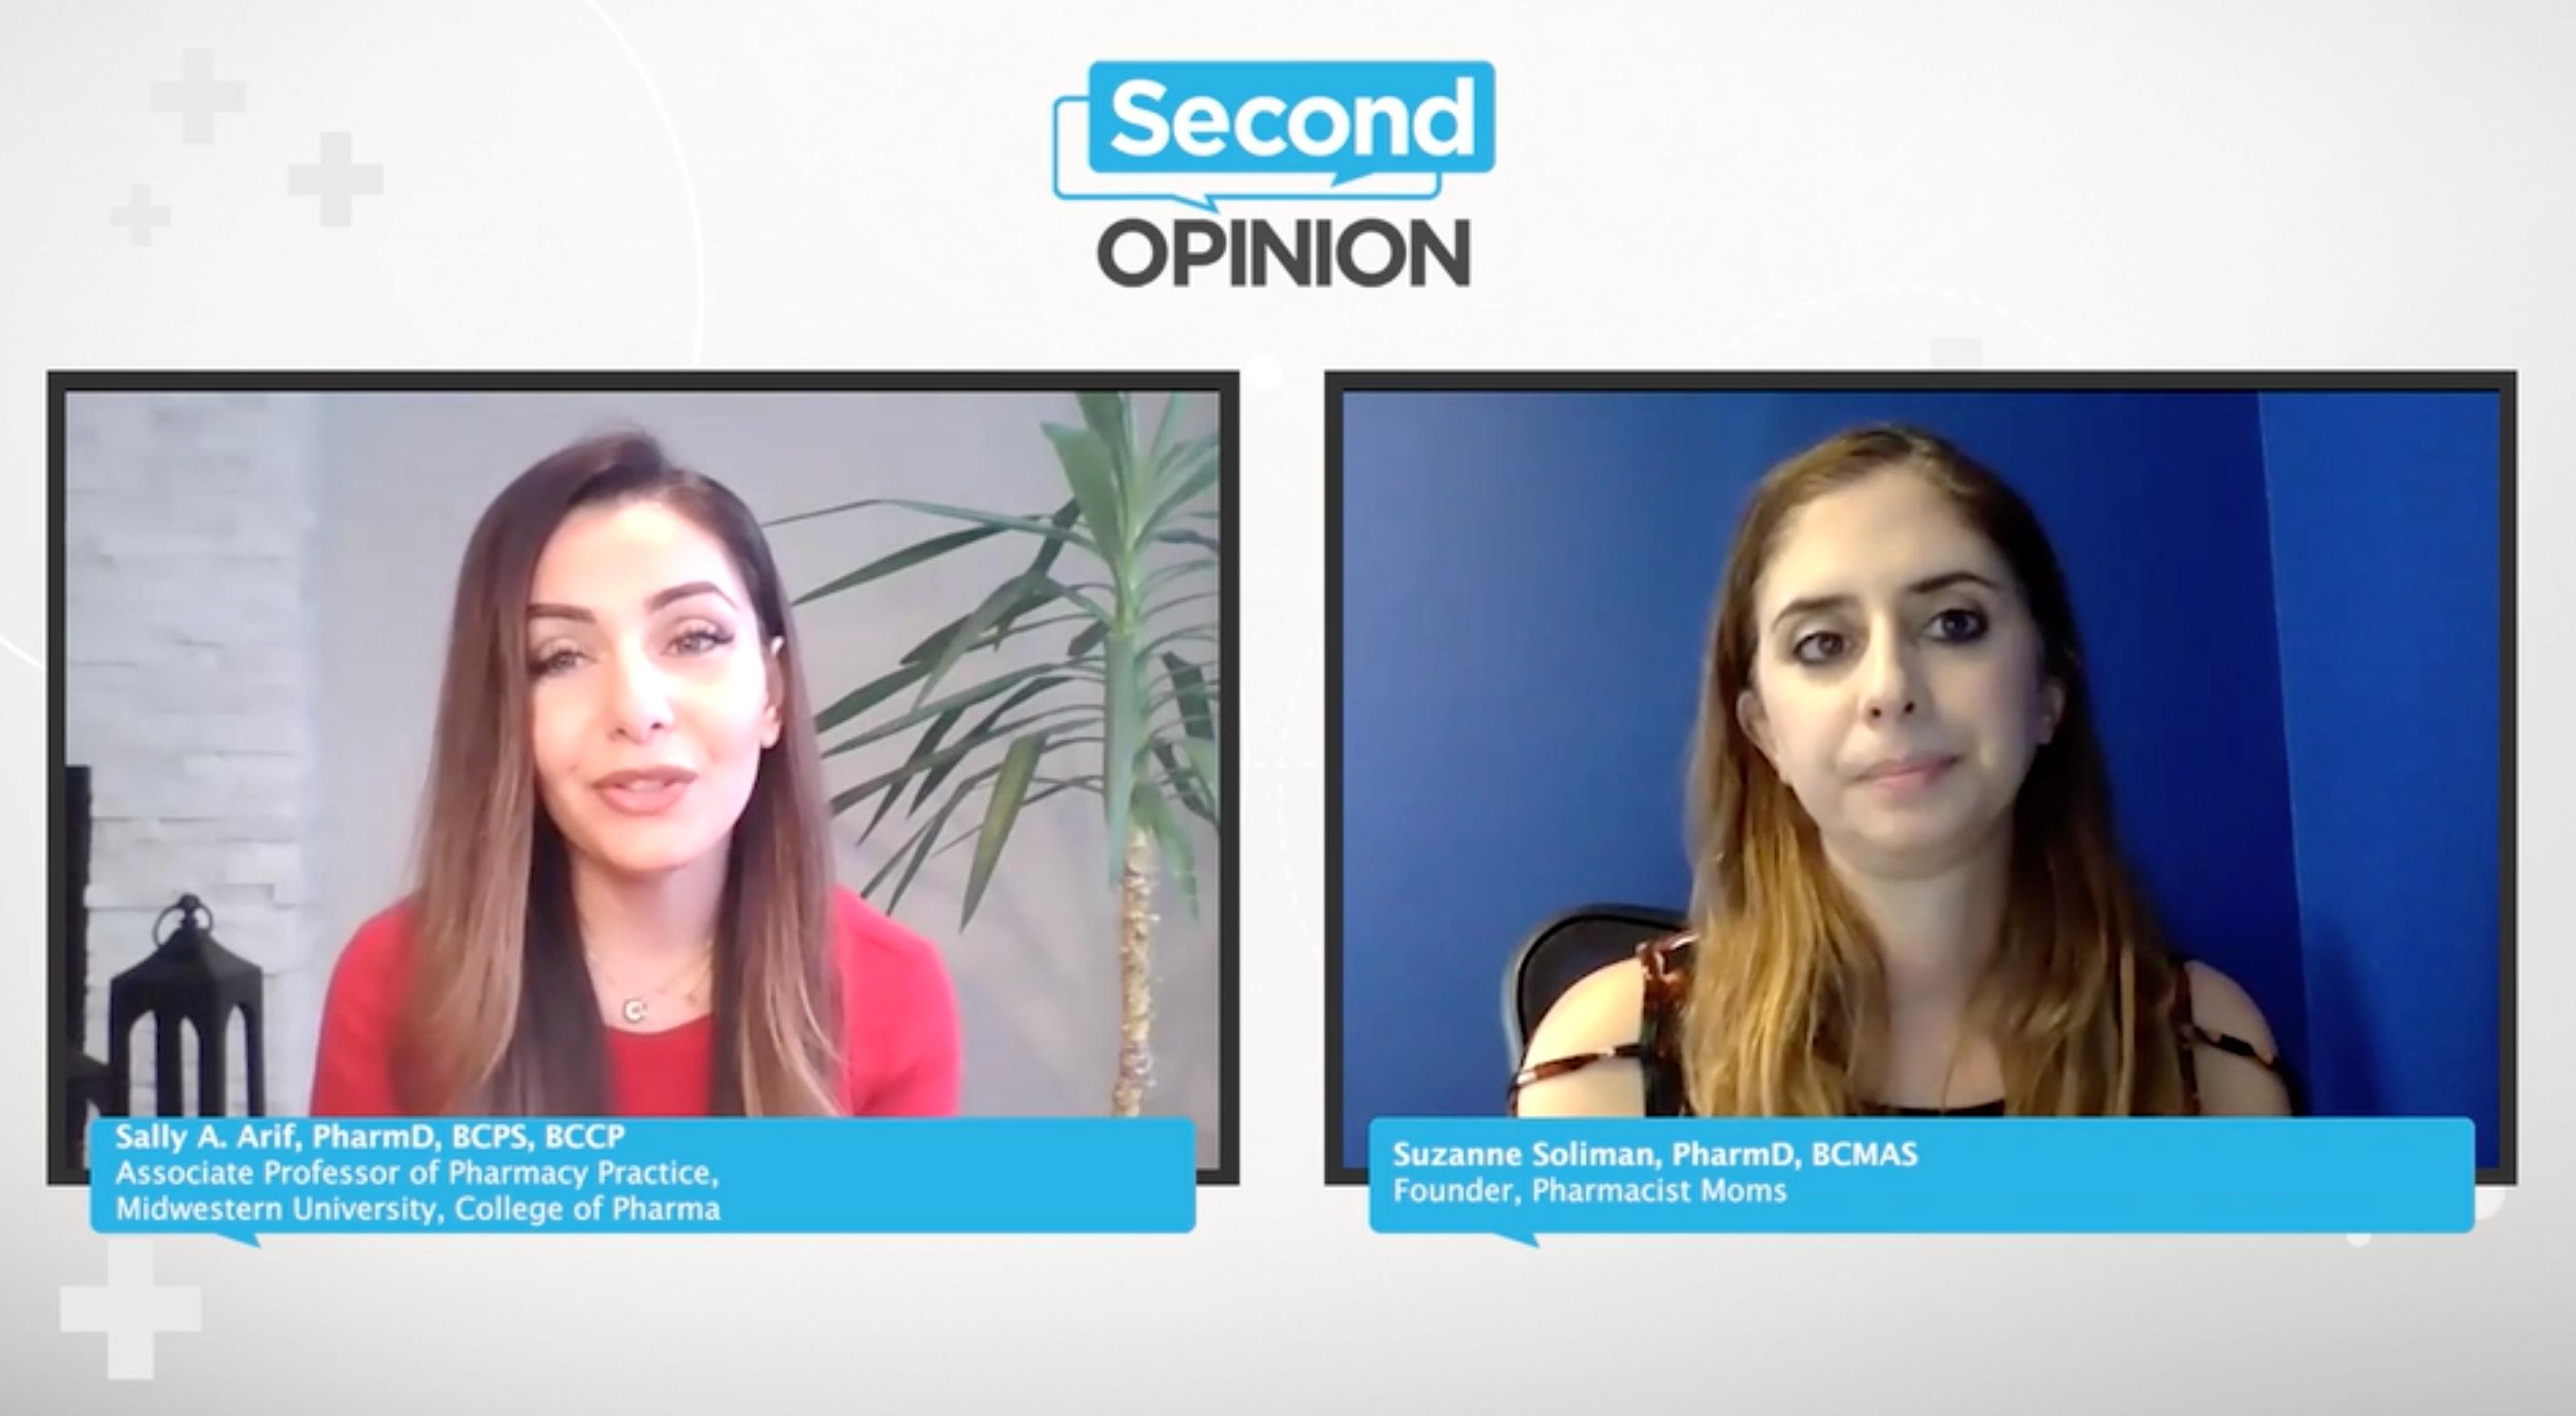 Second Opinion: Addressing COVID-19 Vaccine Hesitancy